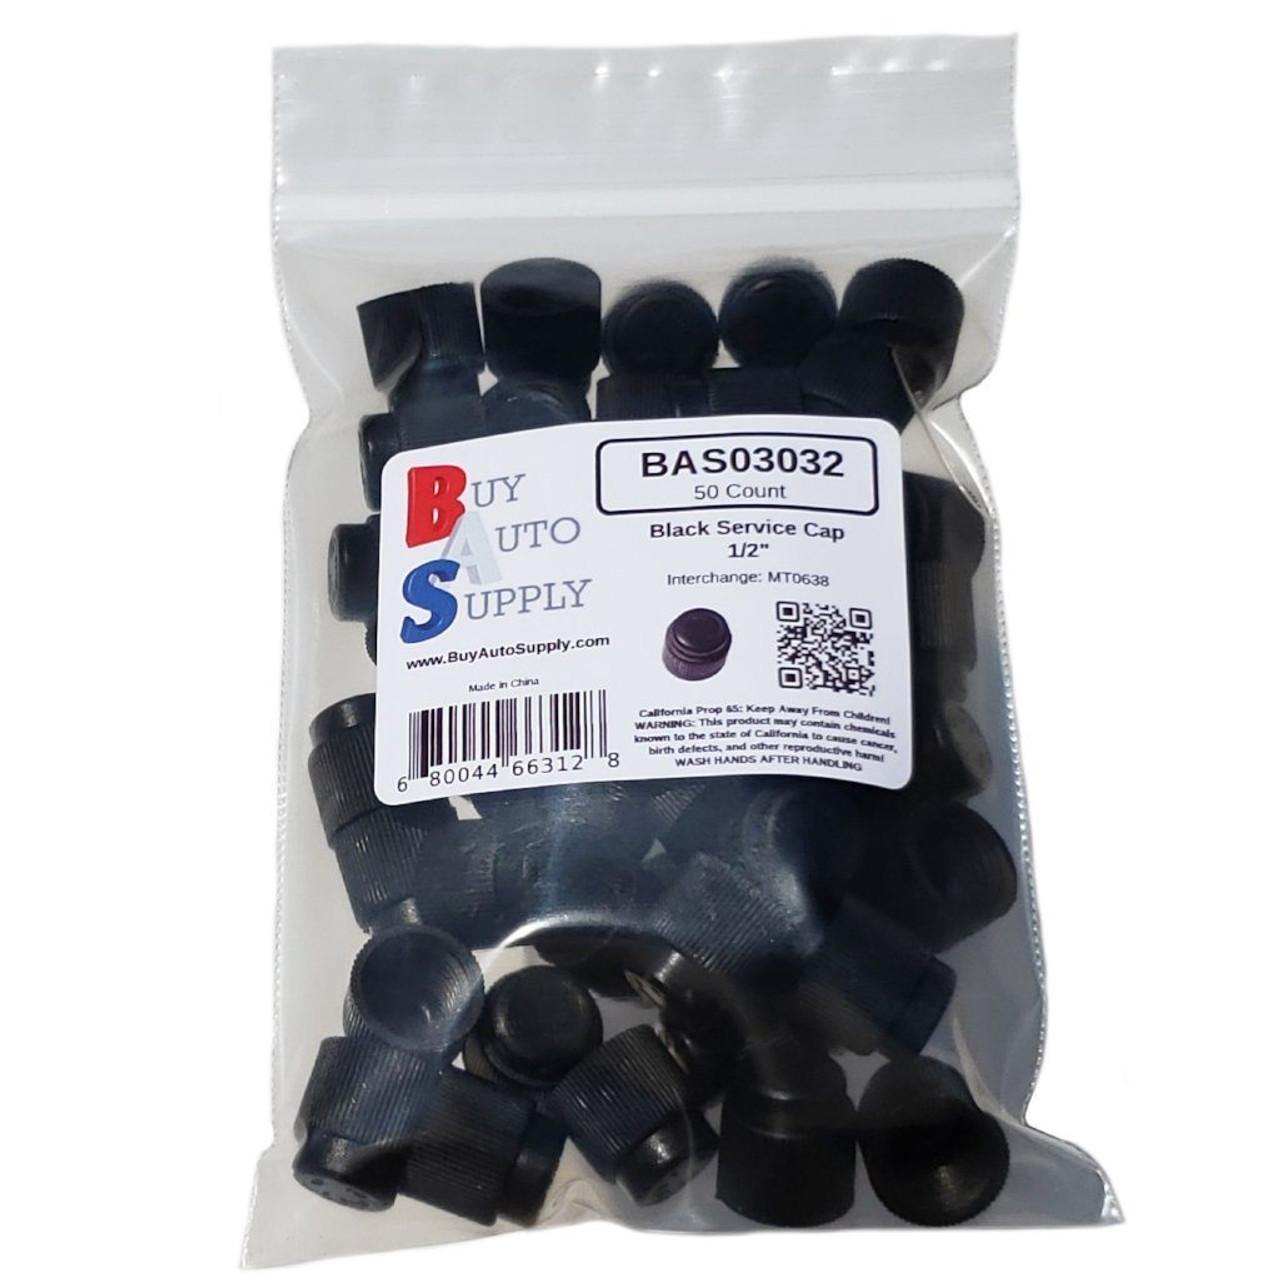 "Bag of 50 AC Service Caps - Black ACME 1/2"" - R12"